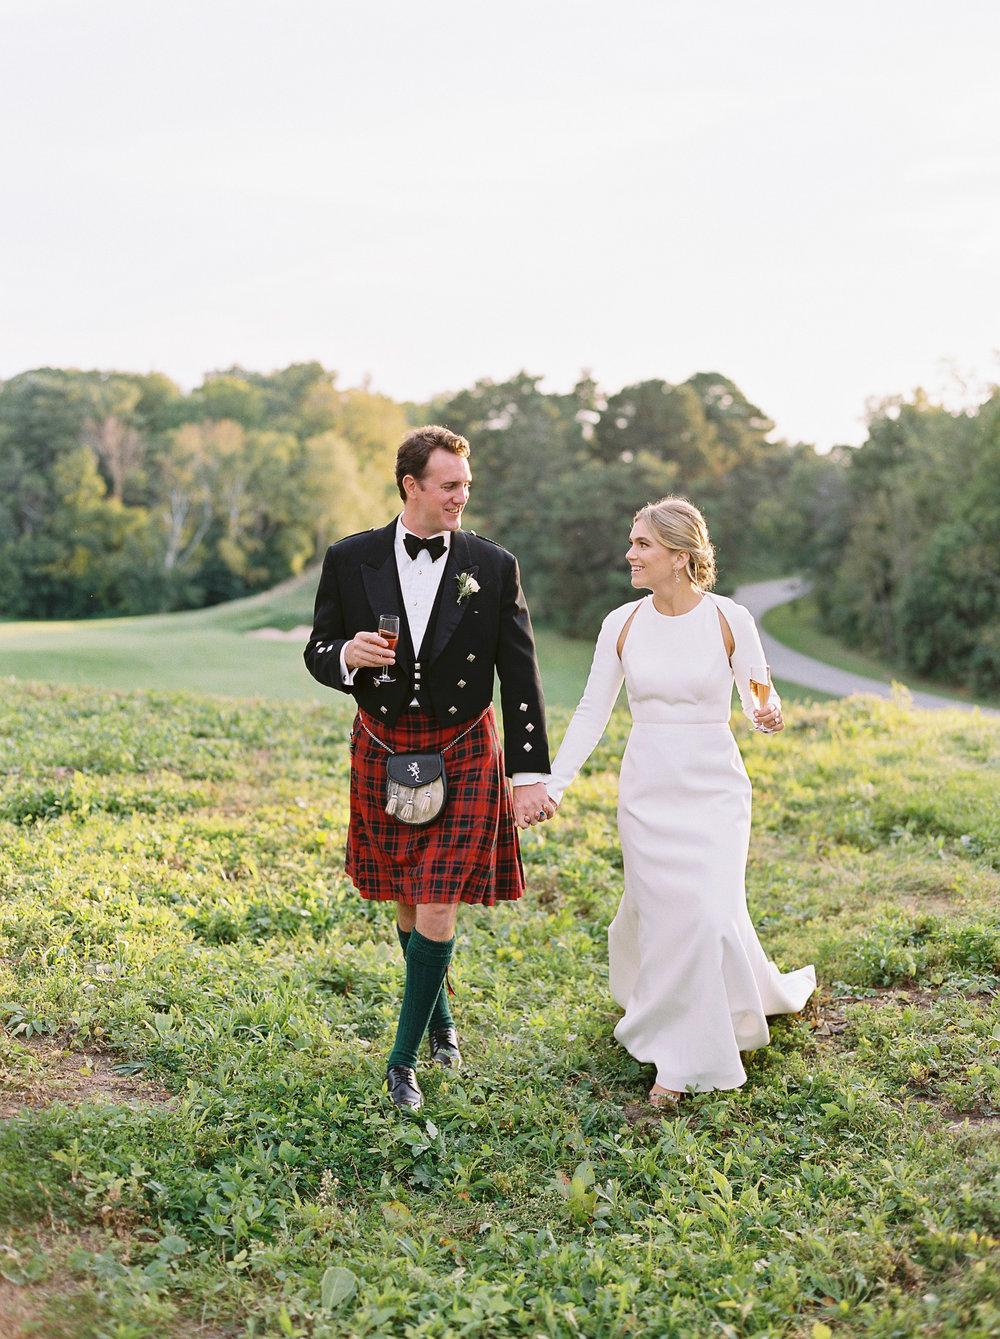 0594-Geneva-Ian-Wedding-Toronto Golf Club-When He Found Her-TorontoPhotographer.jpg